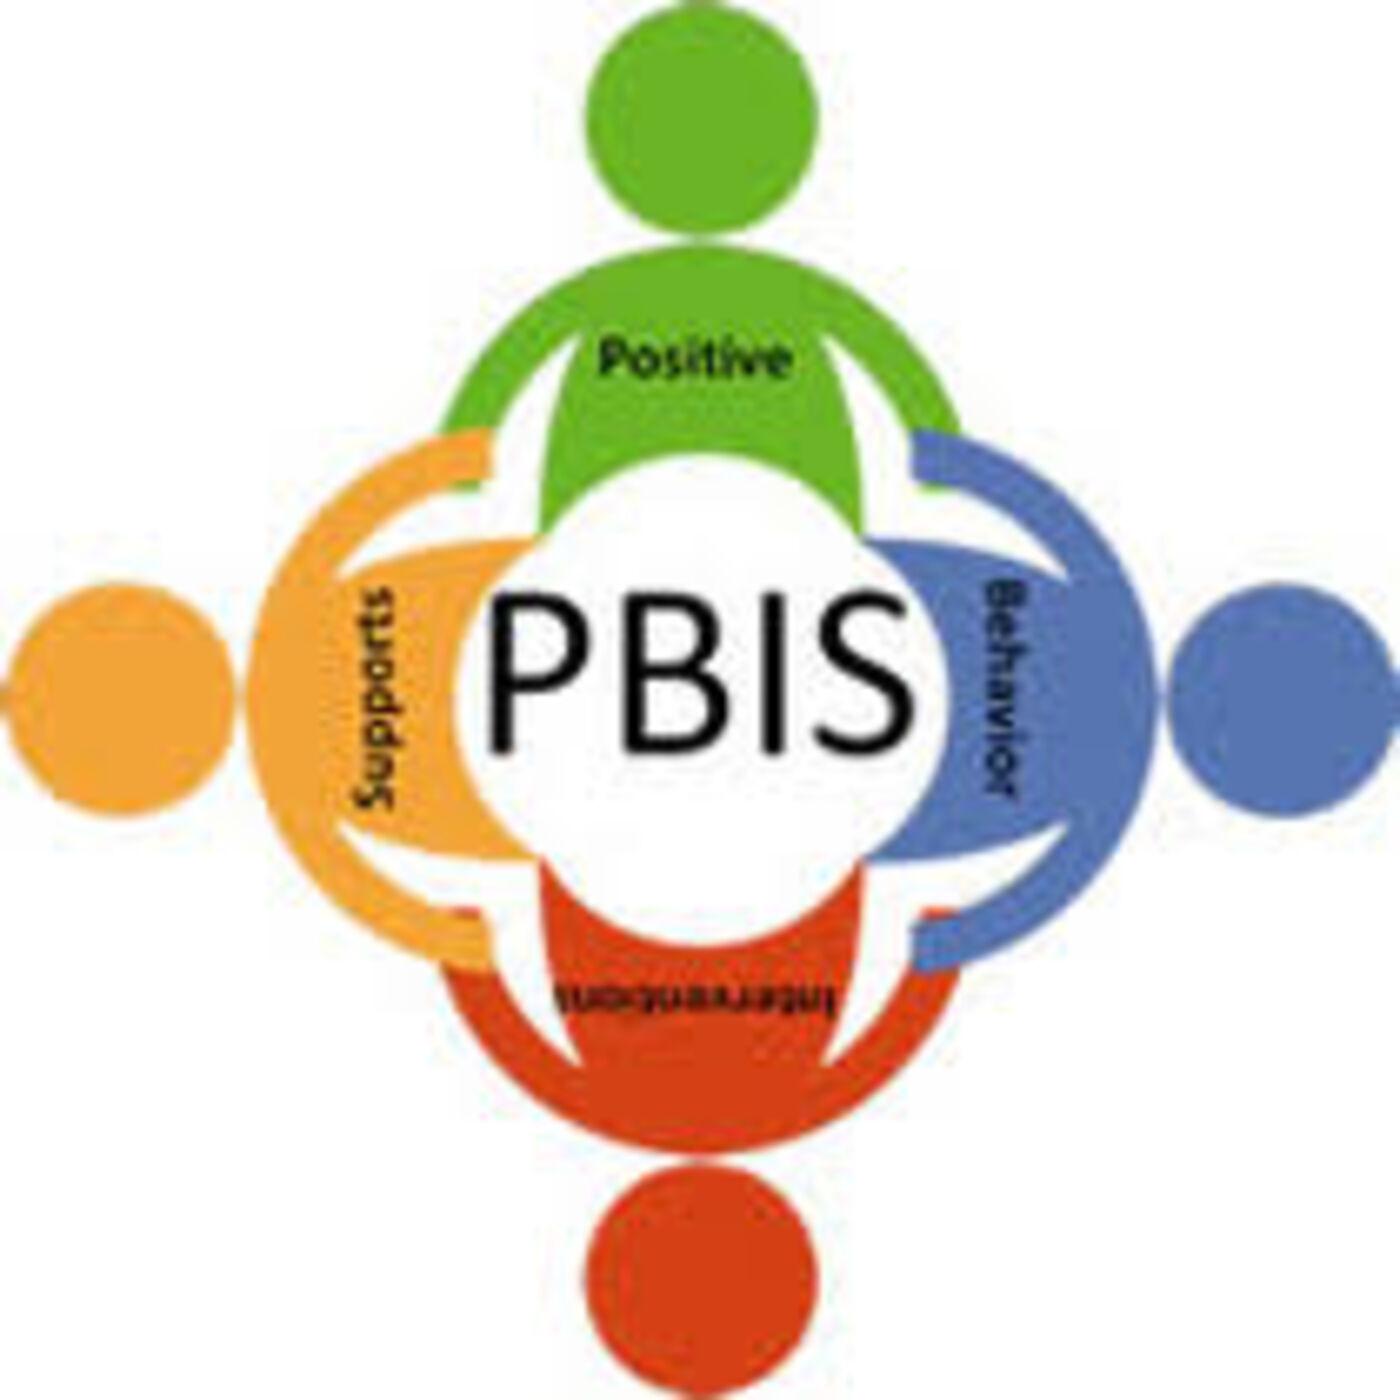 Jessica Reddout Talks PBIS!